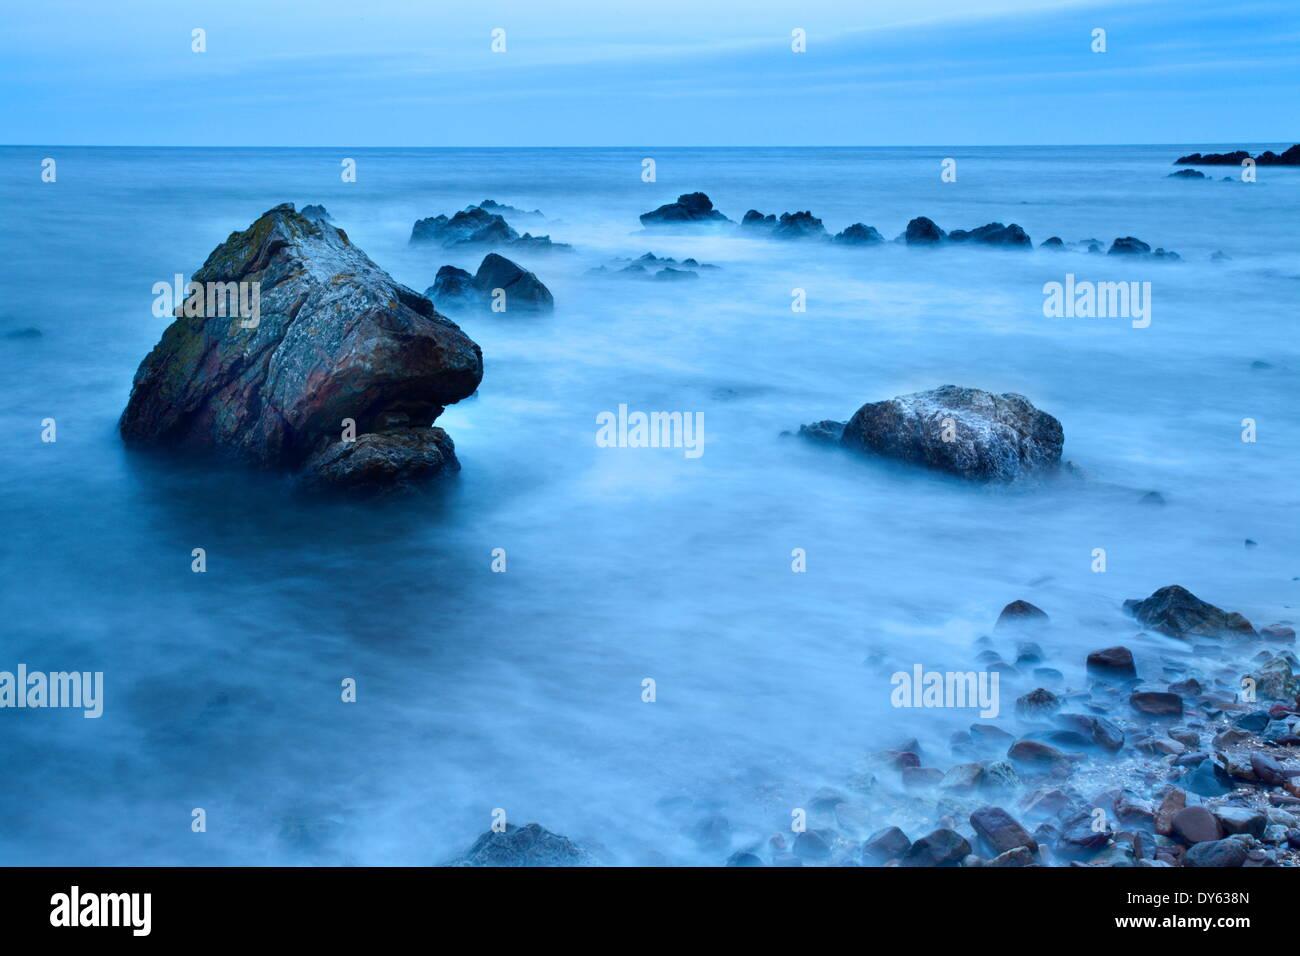 Rocks and sea on the Fife Coast near St. Andrews, Fife, Scotland, United Kingdom, Europe - Stock Image